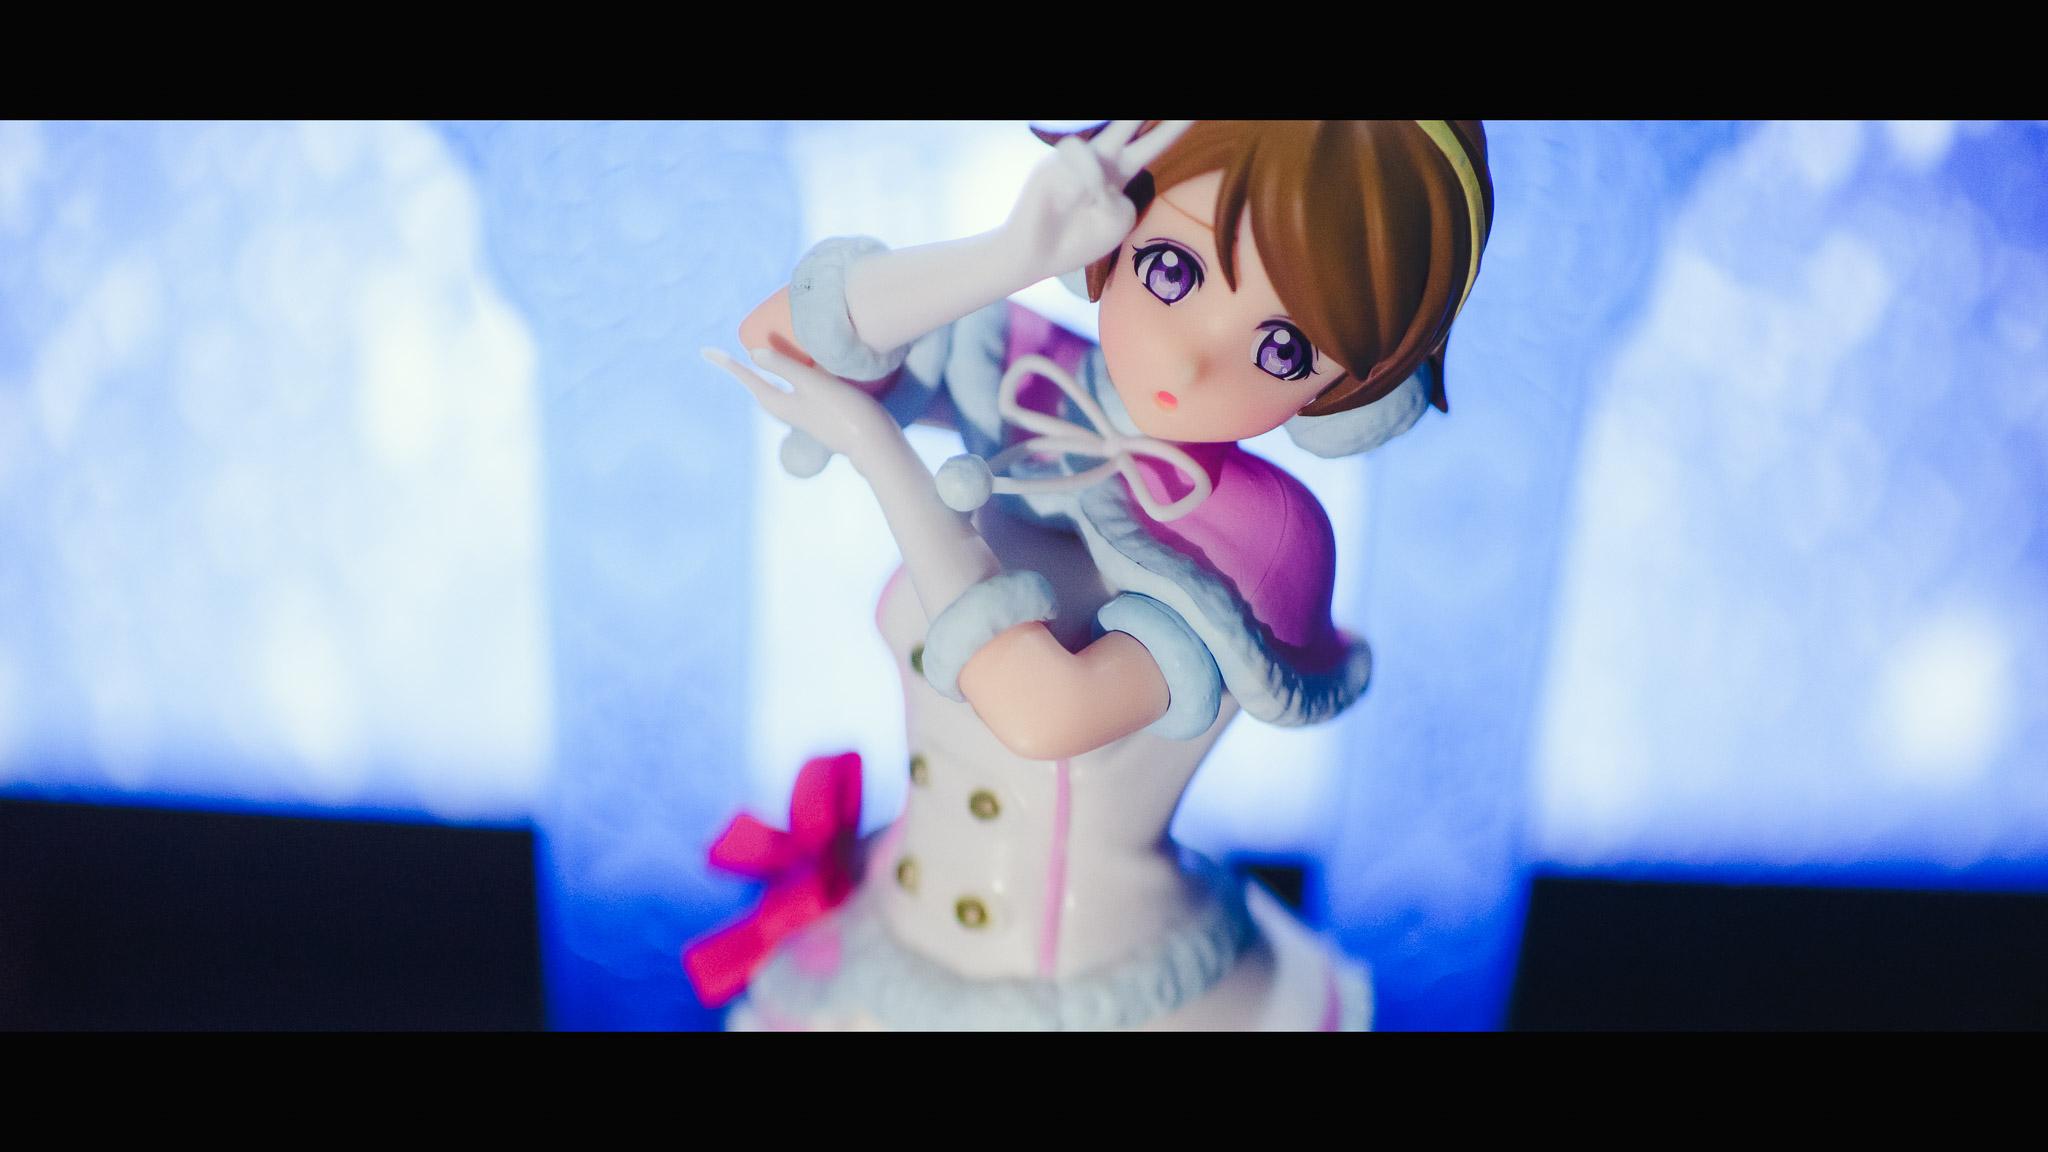 sega love_live!_school_idol_project koizumi_hanayo spm_figure